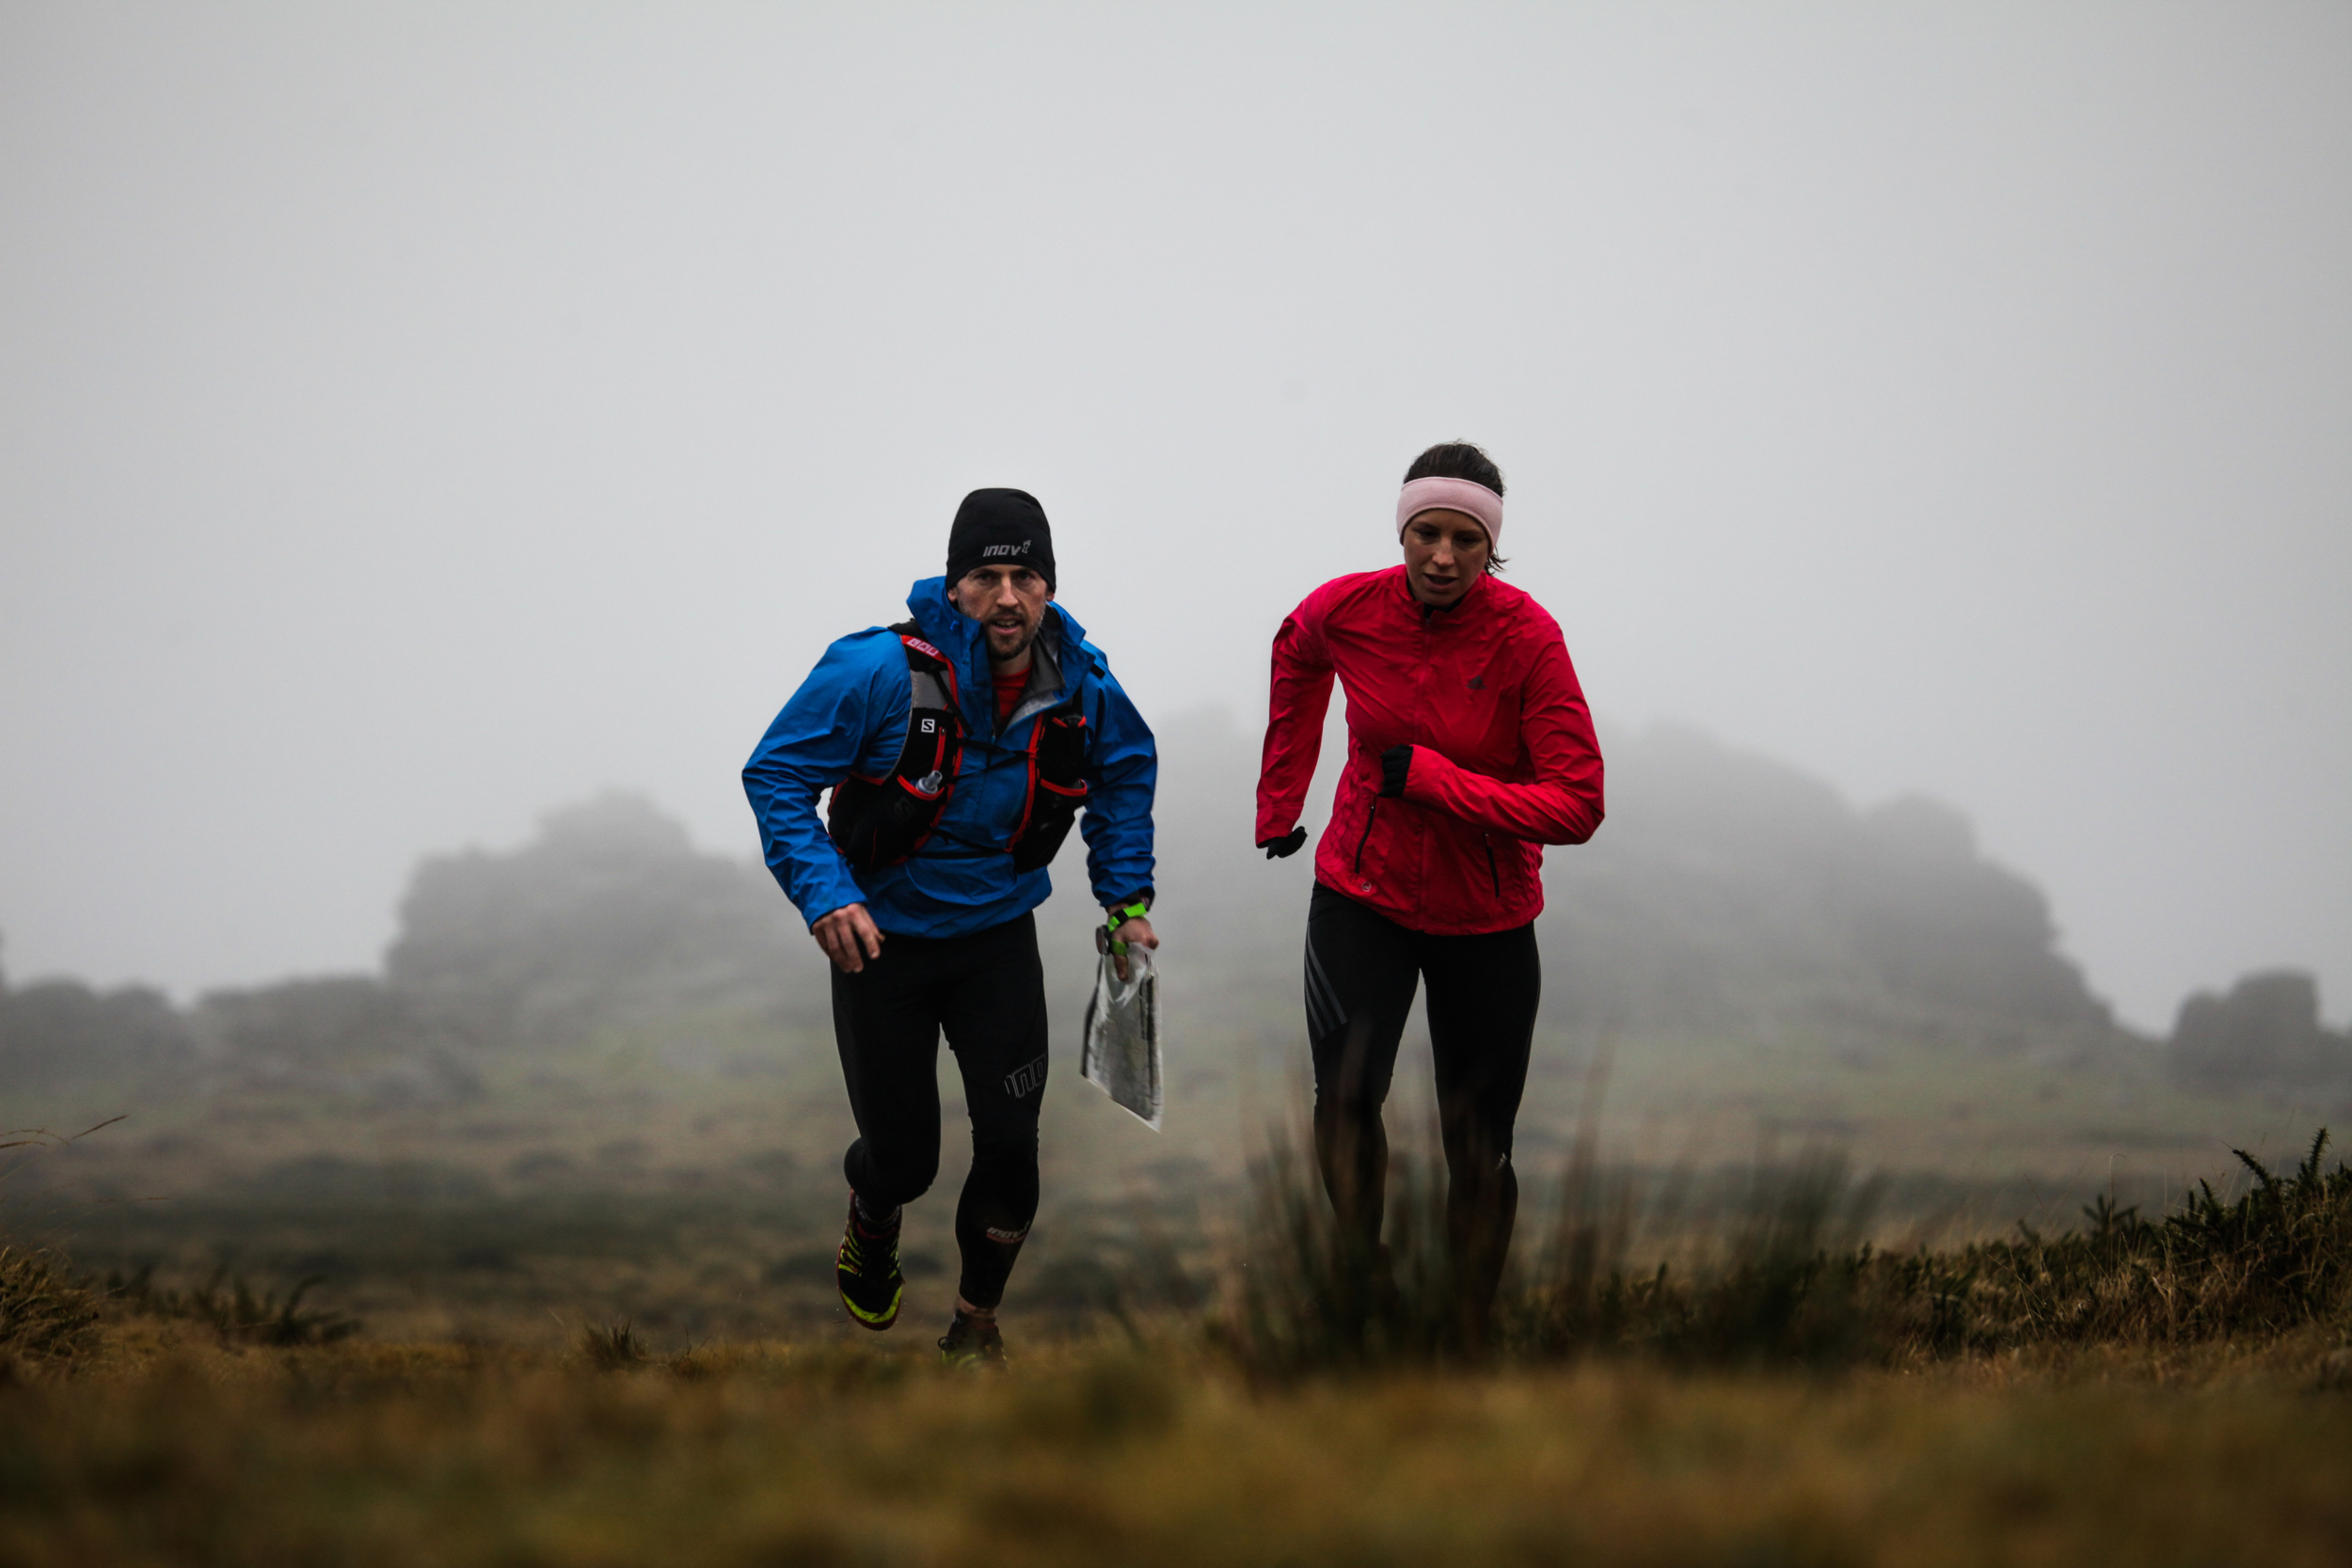 Great British MINI Adventure Day 13 - Dartmoor Ten Tors Mini Challenge with Heather Fell